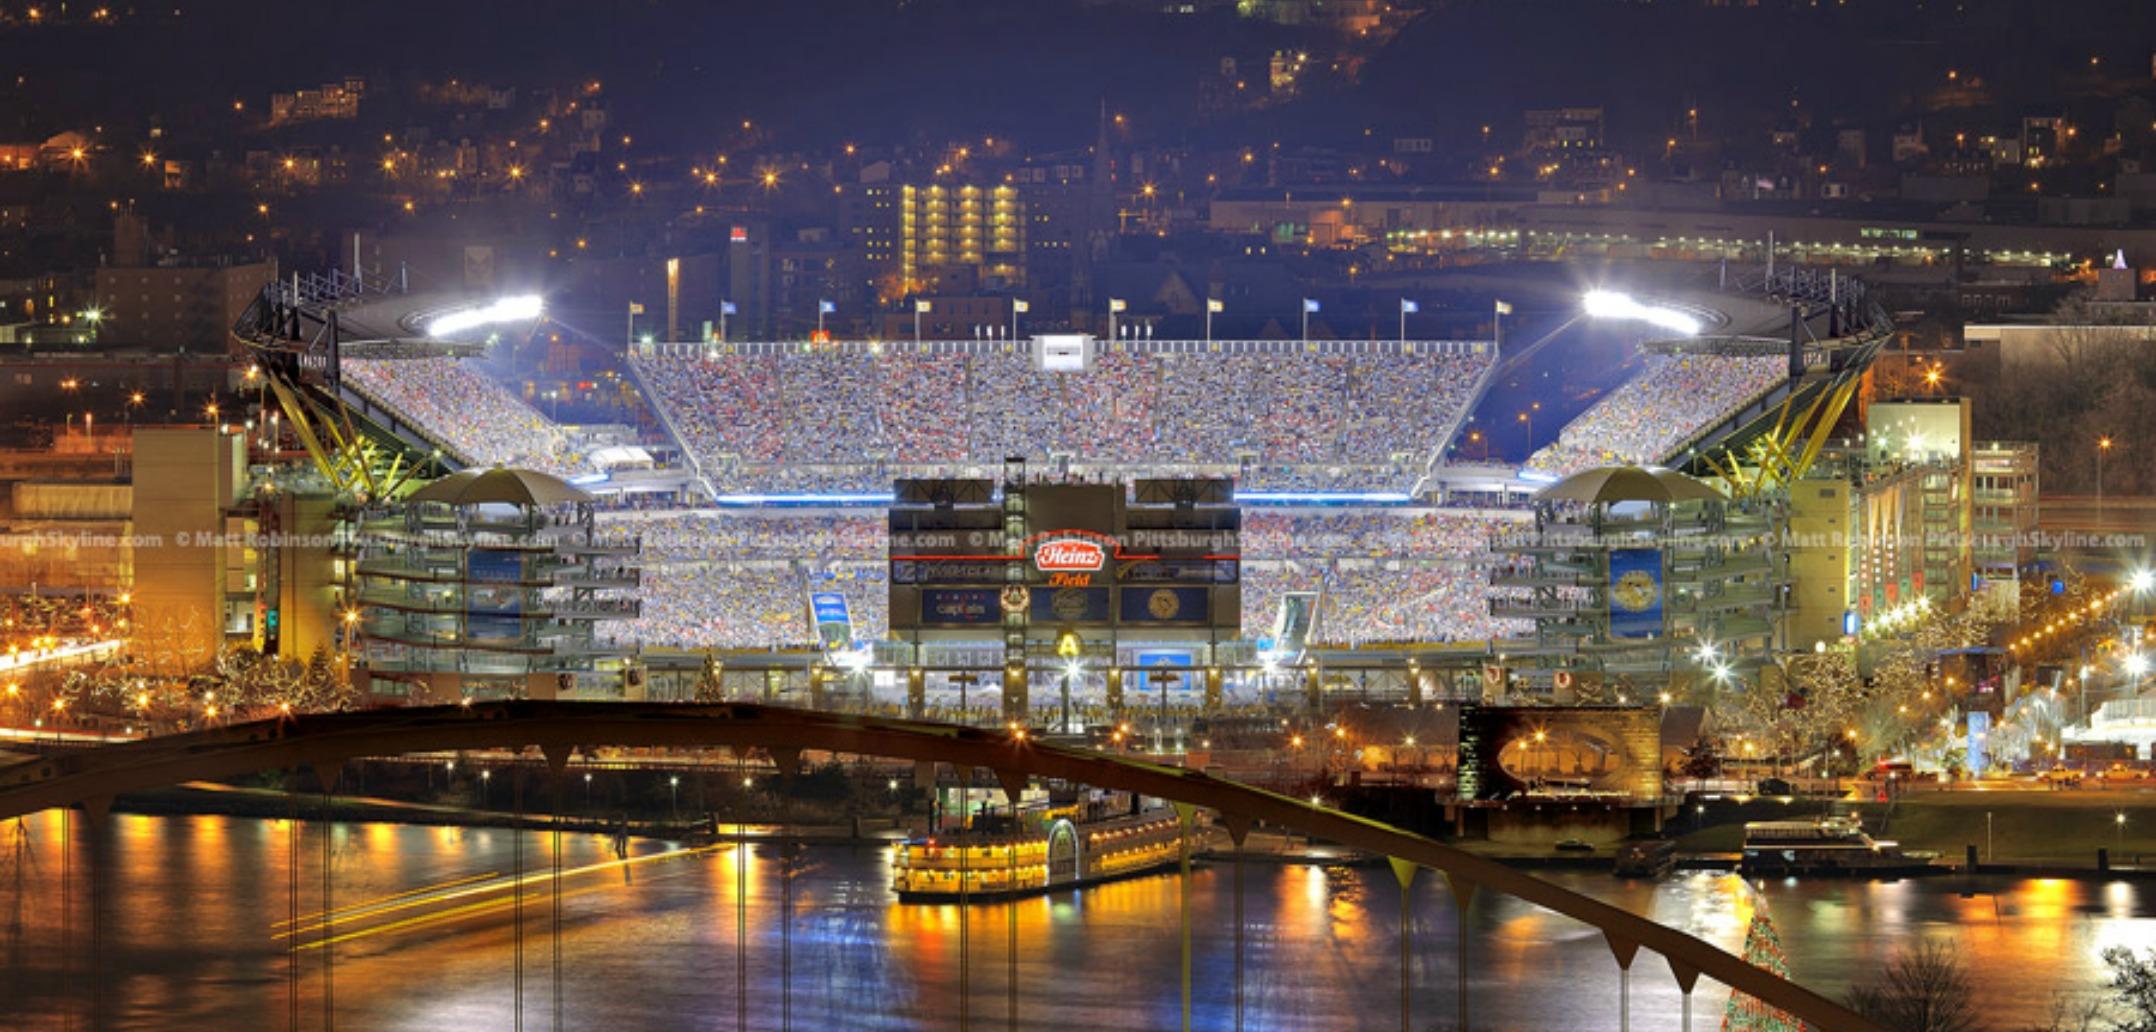 Courtesy of Pittsburghskyline.com